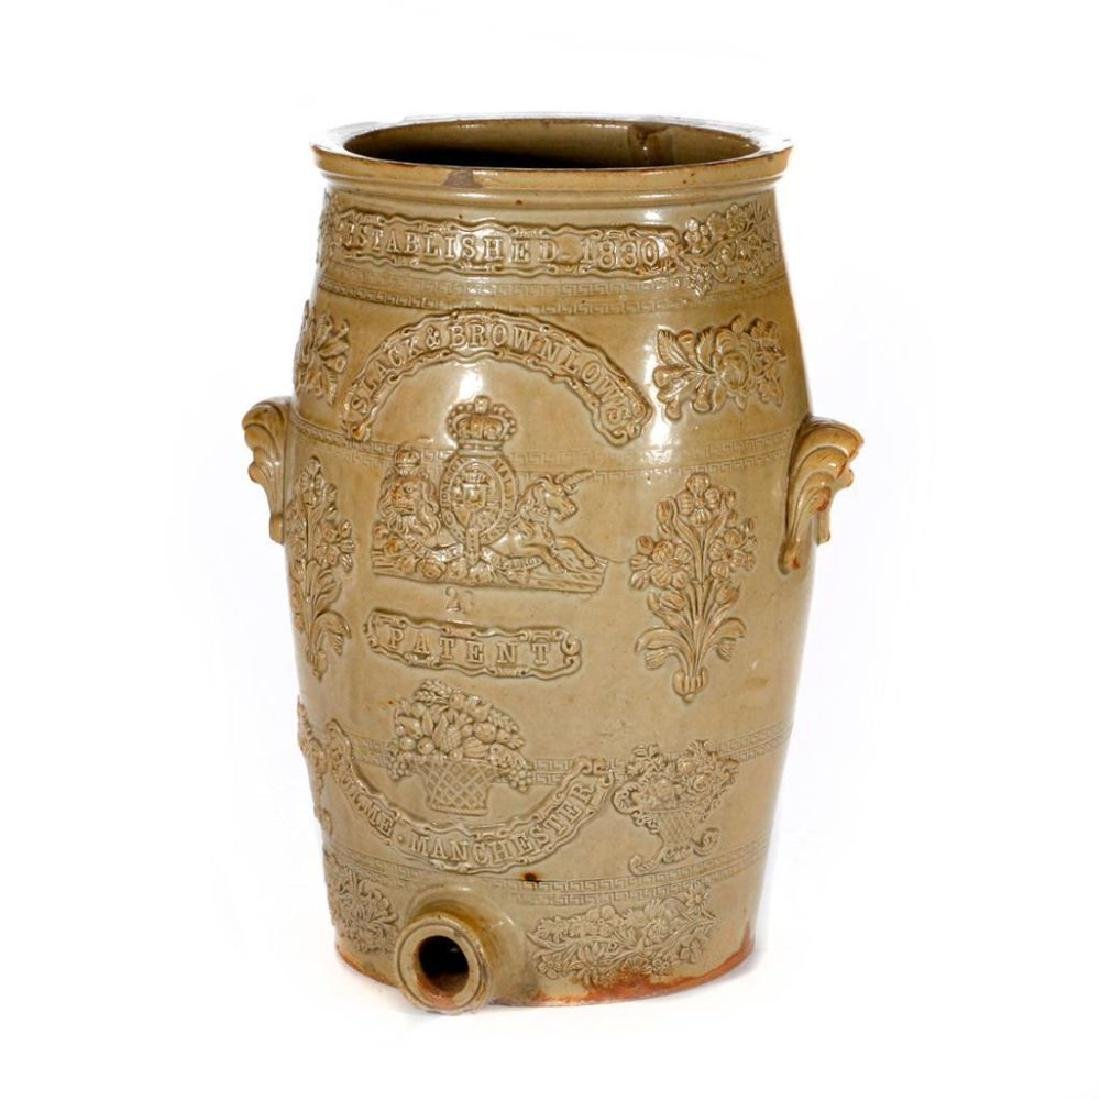 A 19th century English Stoneware spirit barrel.